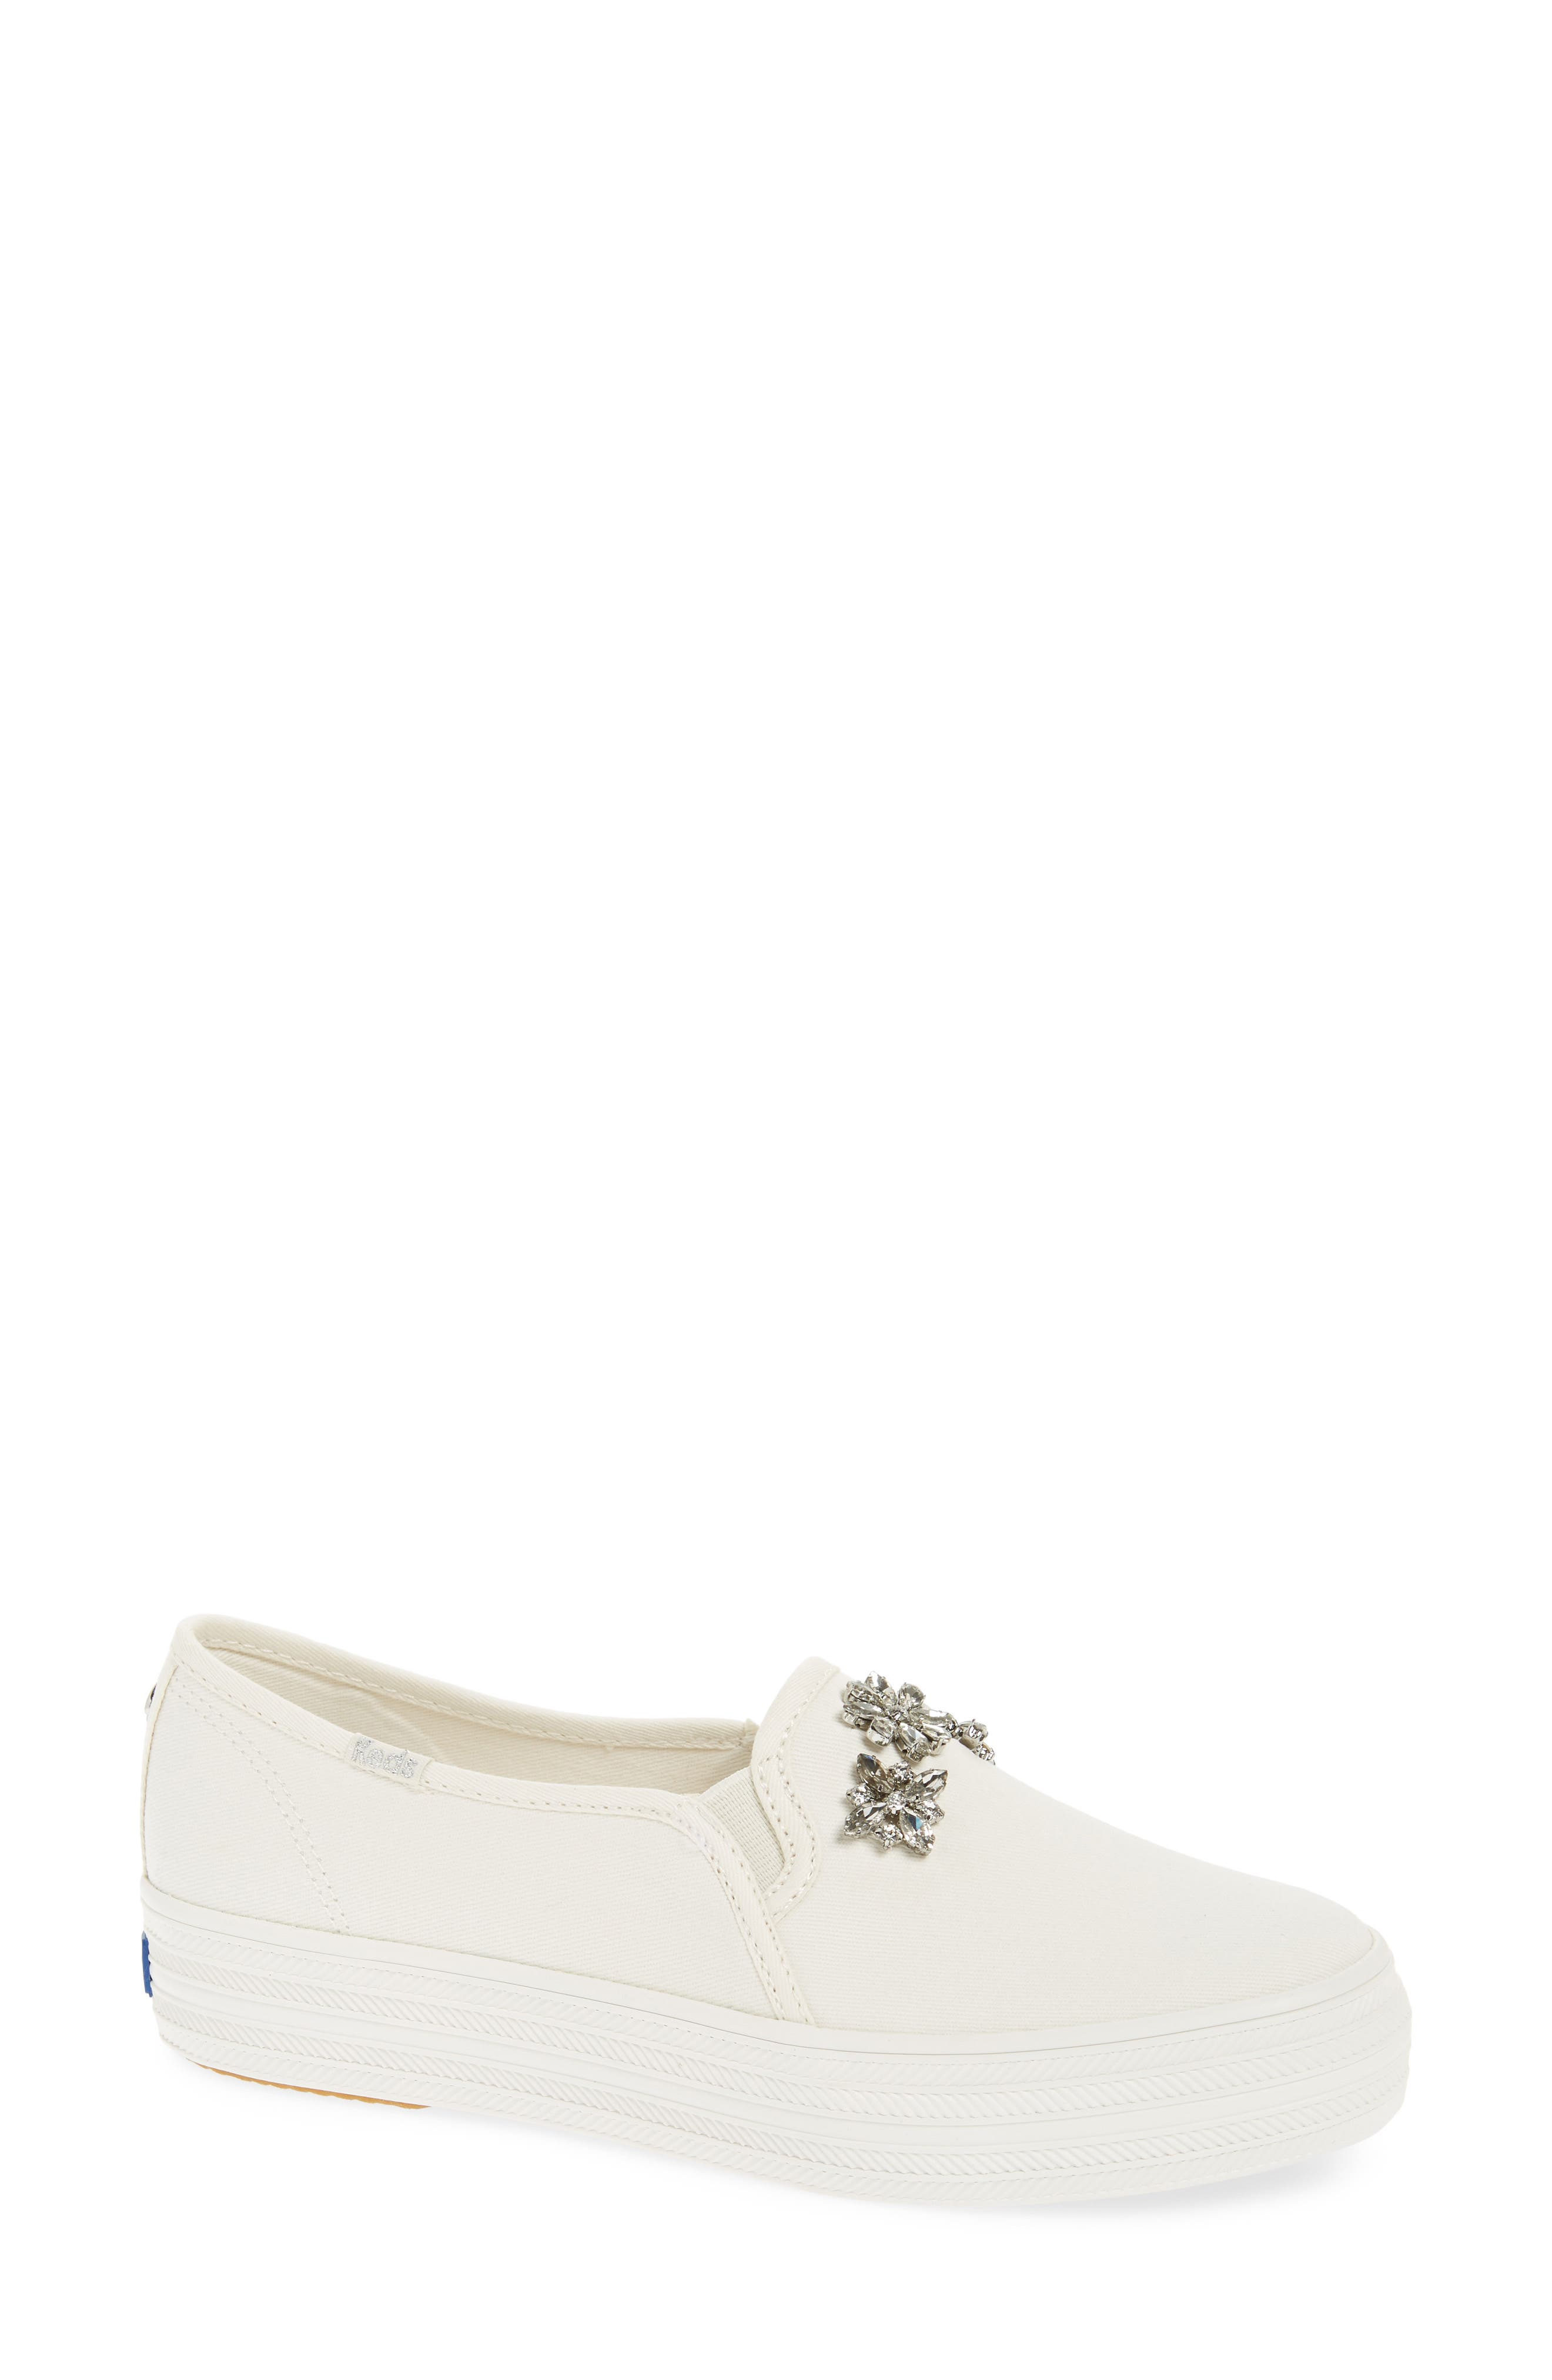 triple decker stones slip-on sneaker,                         Main,                         color, CREAM